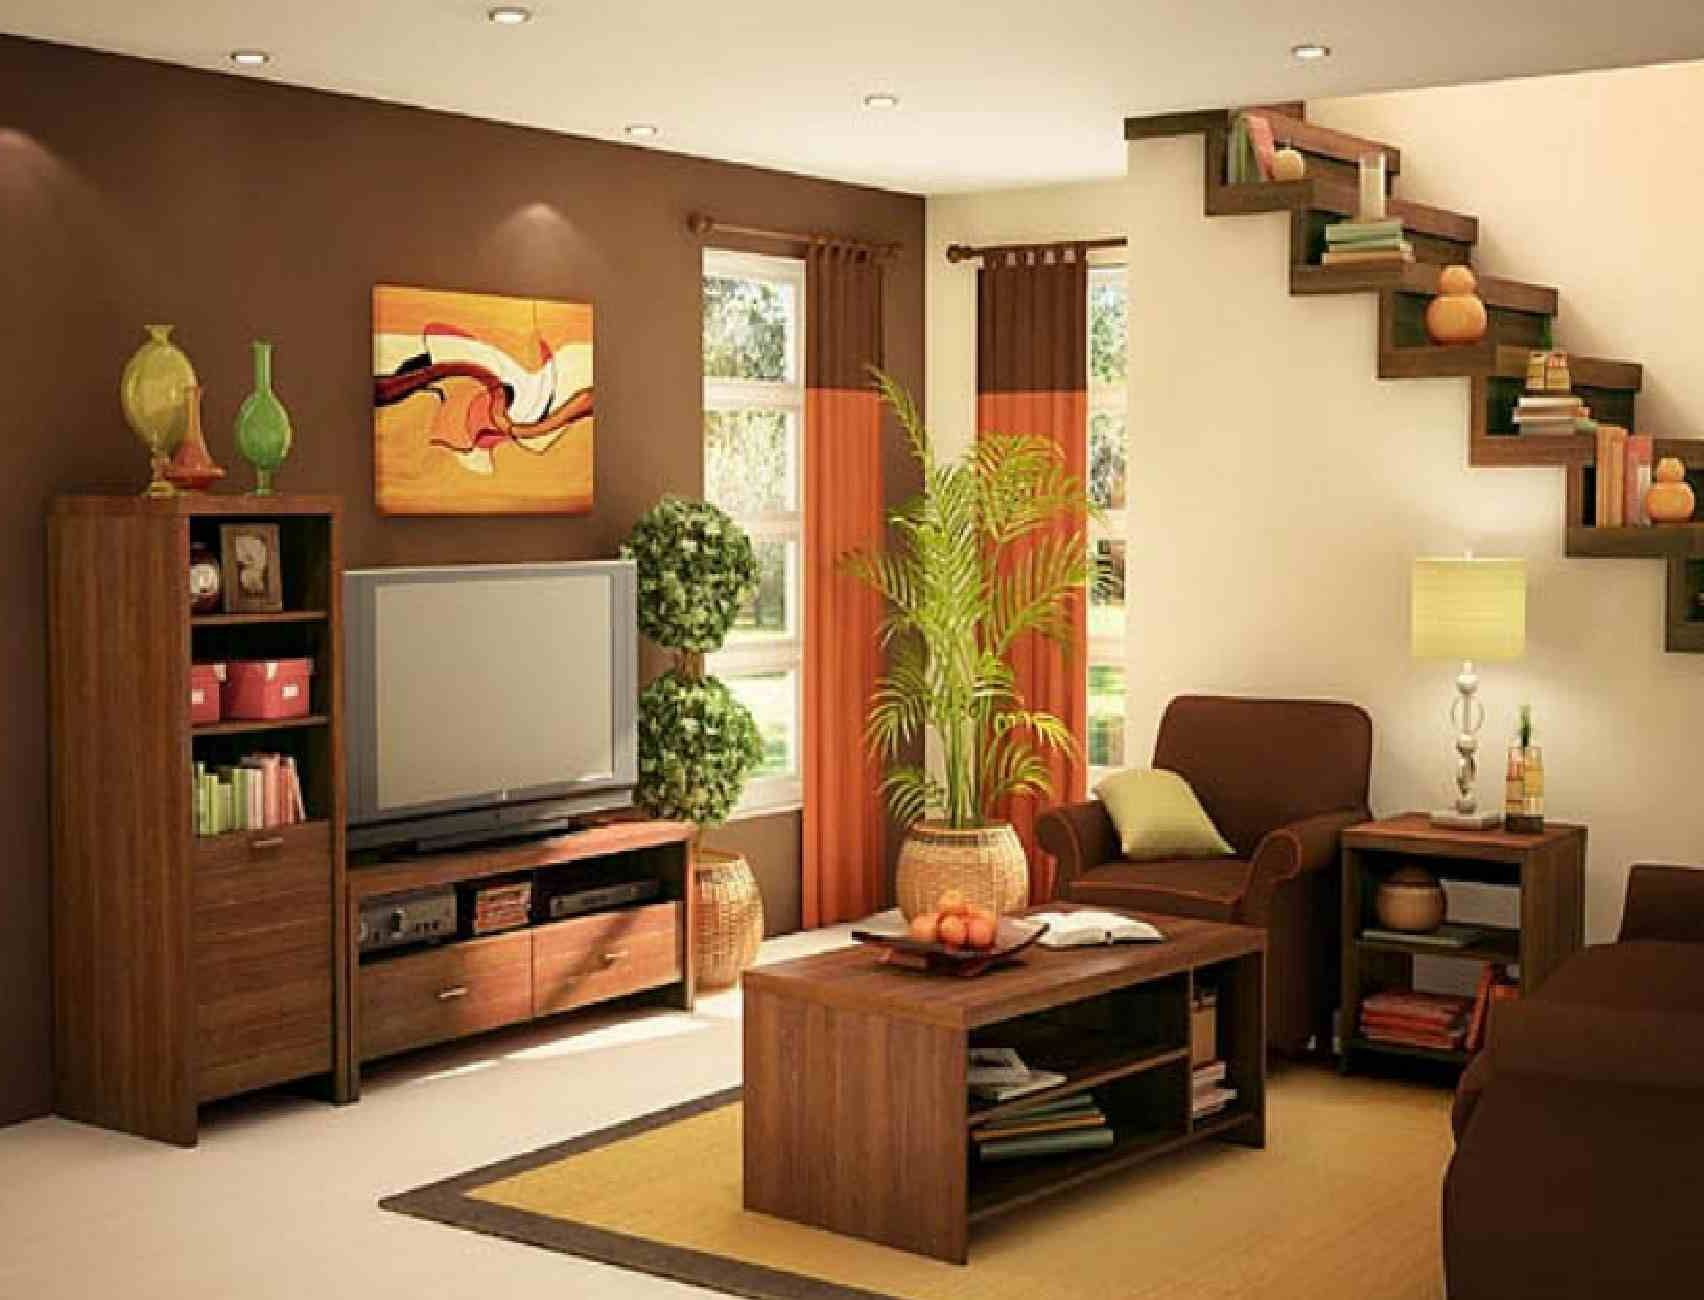 Living Room Interior Design India Simple For Indian Style Small House Interior Small House Interior Design Small Living Rooms